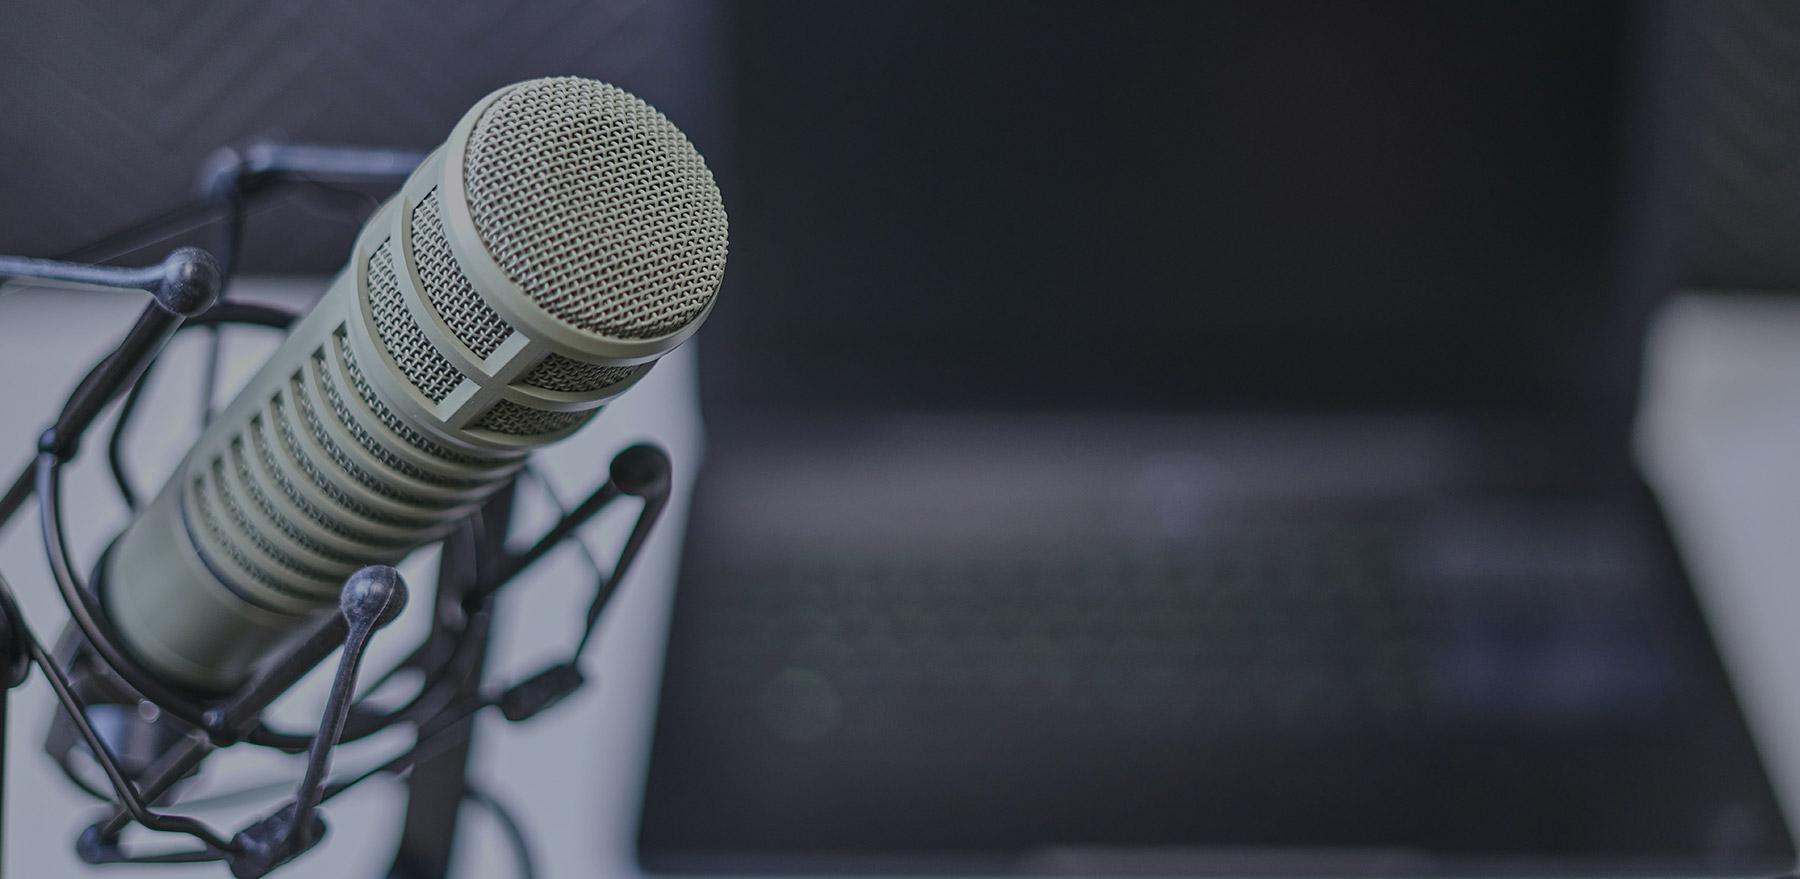 Mikrofoni ja tietokone